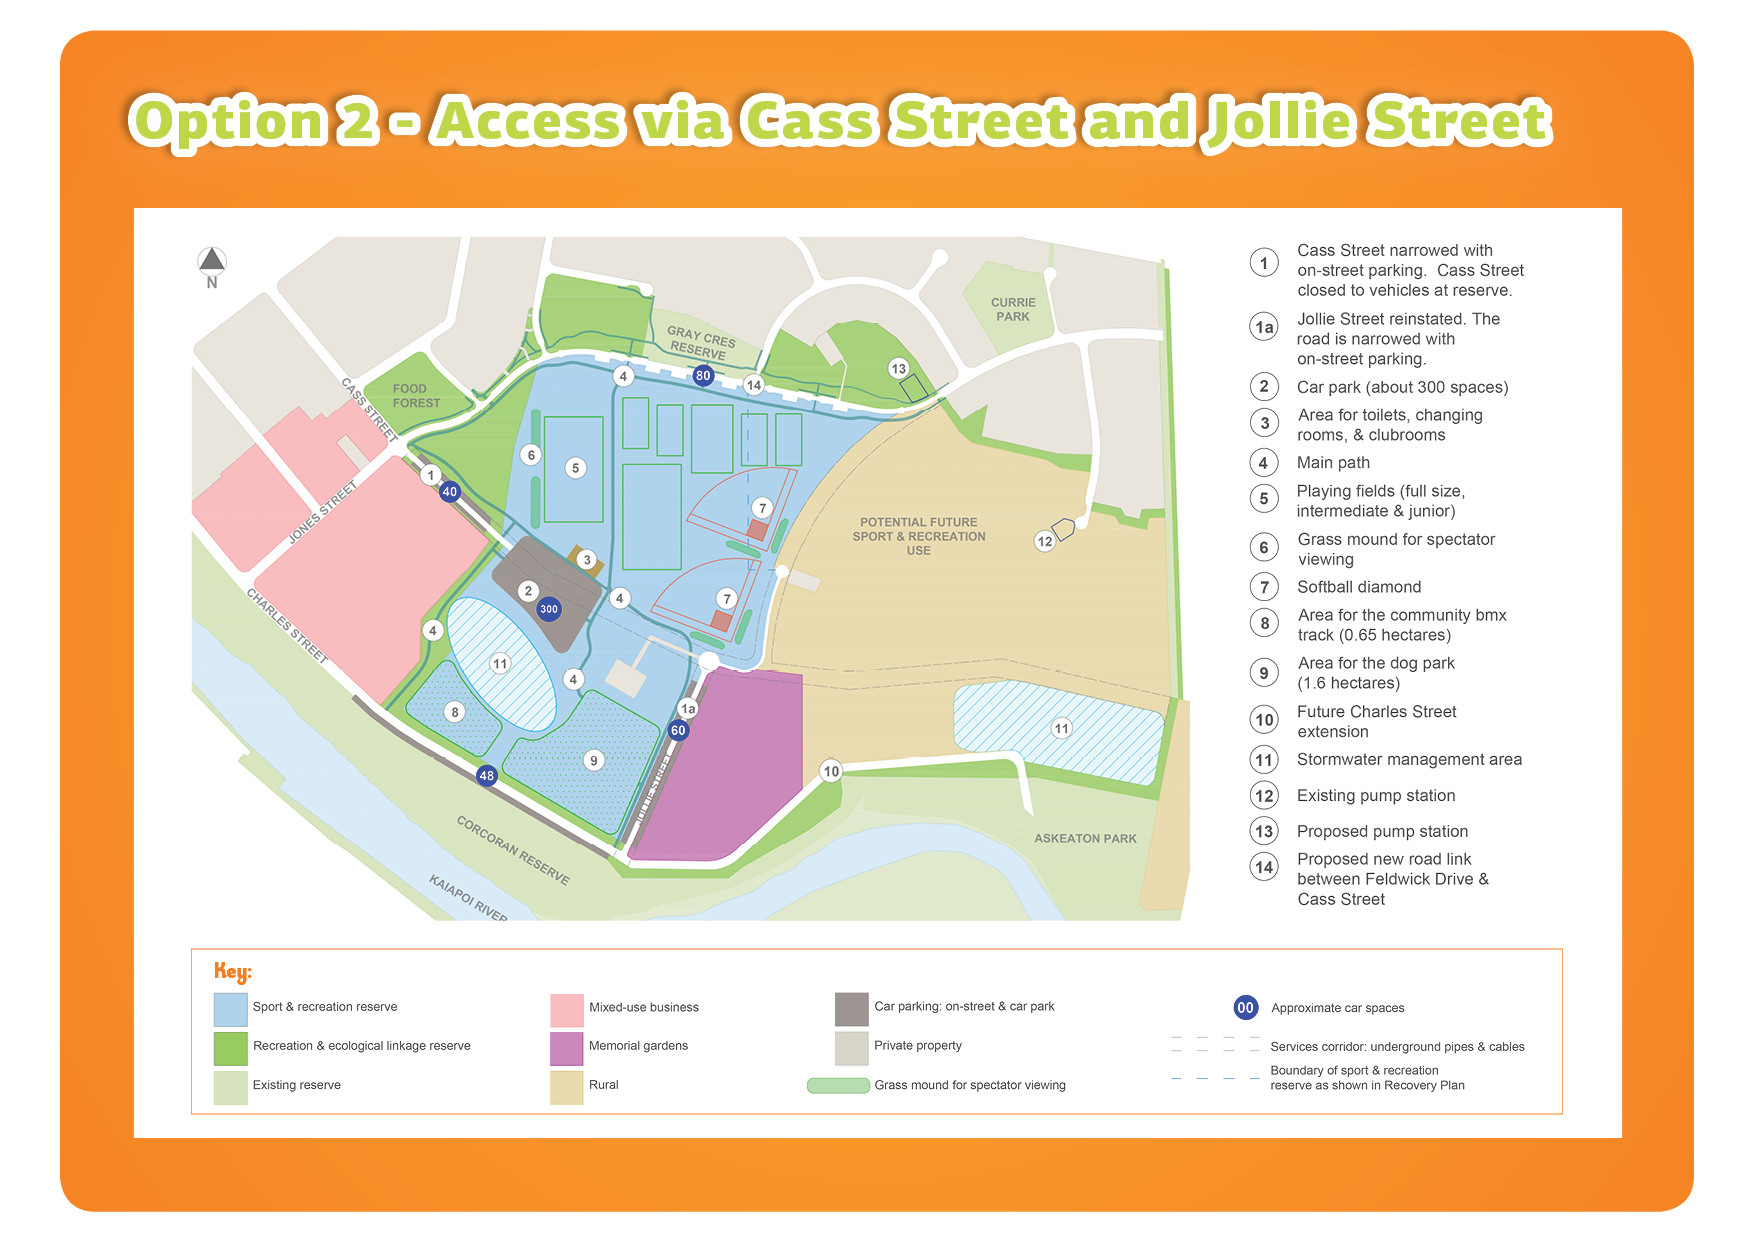 Kaiapoi East Regeneration Area - Reserve Road Access Option 2 map